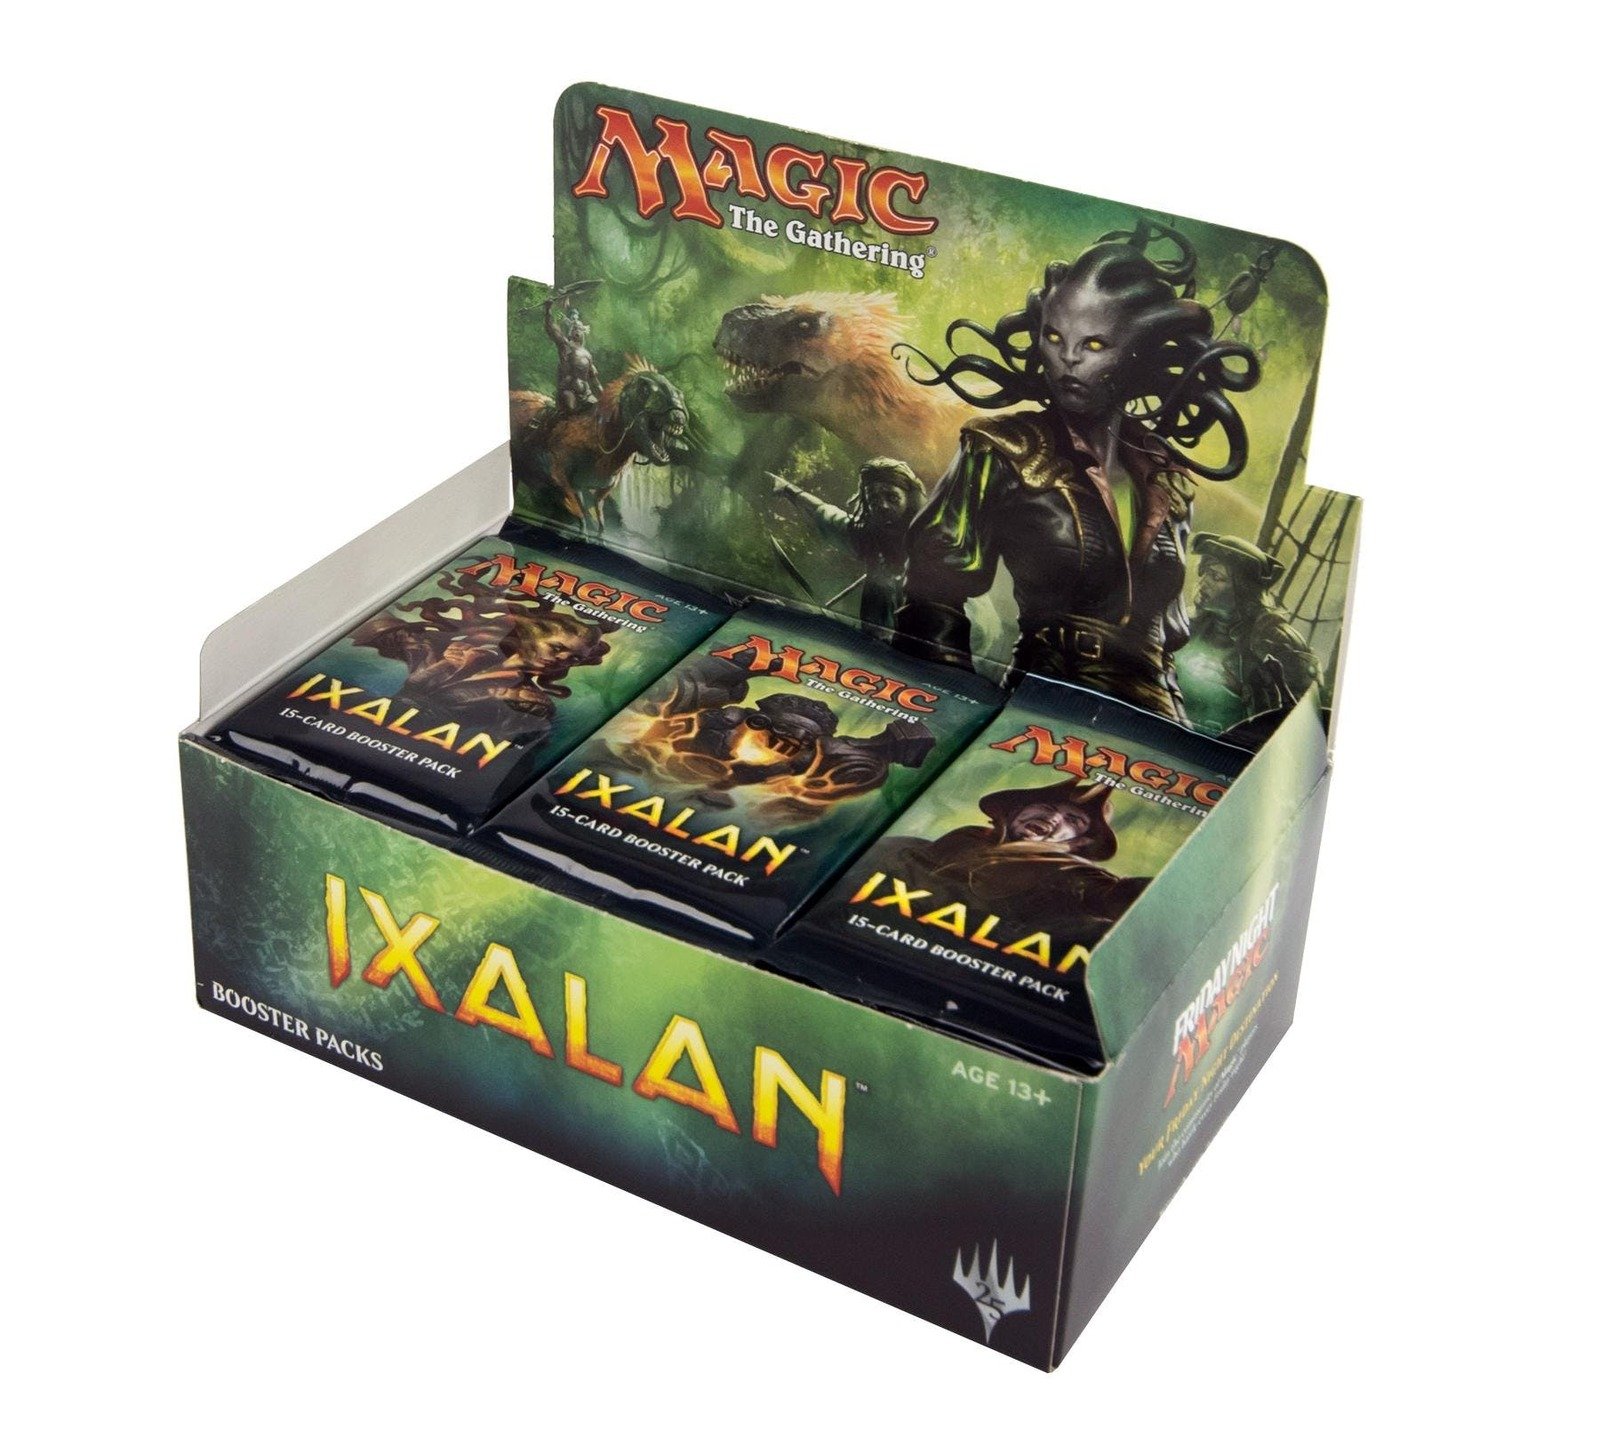 Magic The Gathering: Ixalan Booster Box image